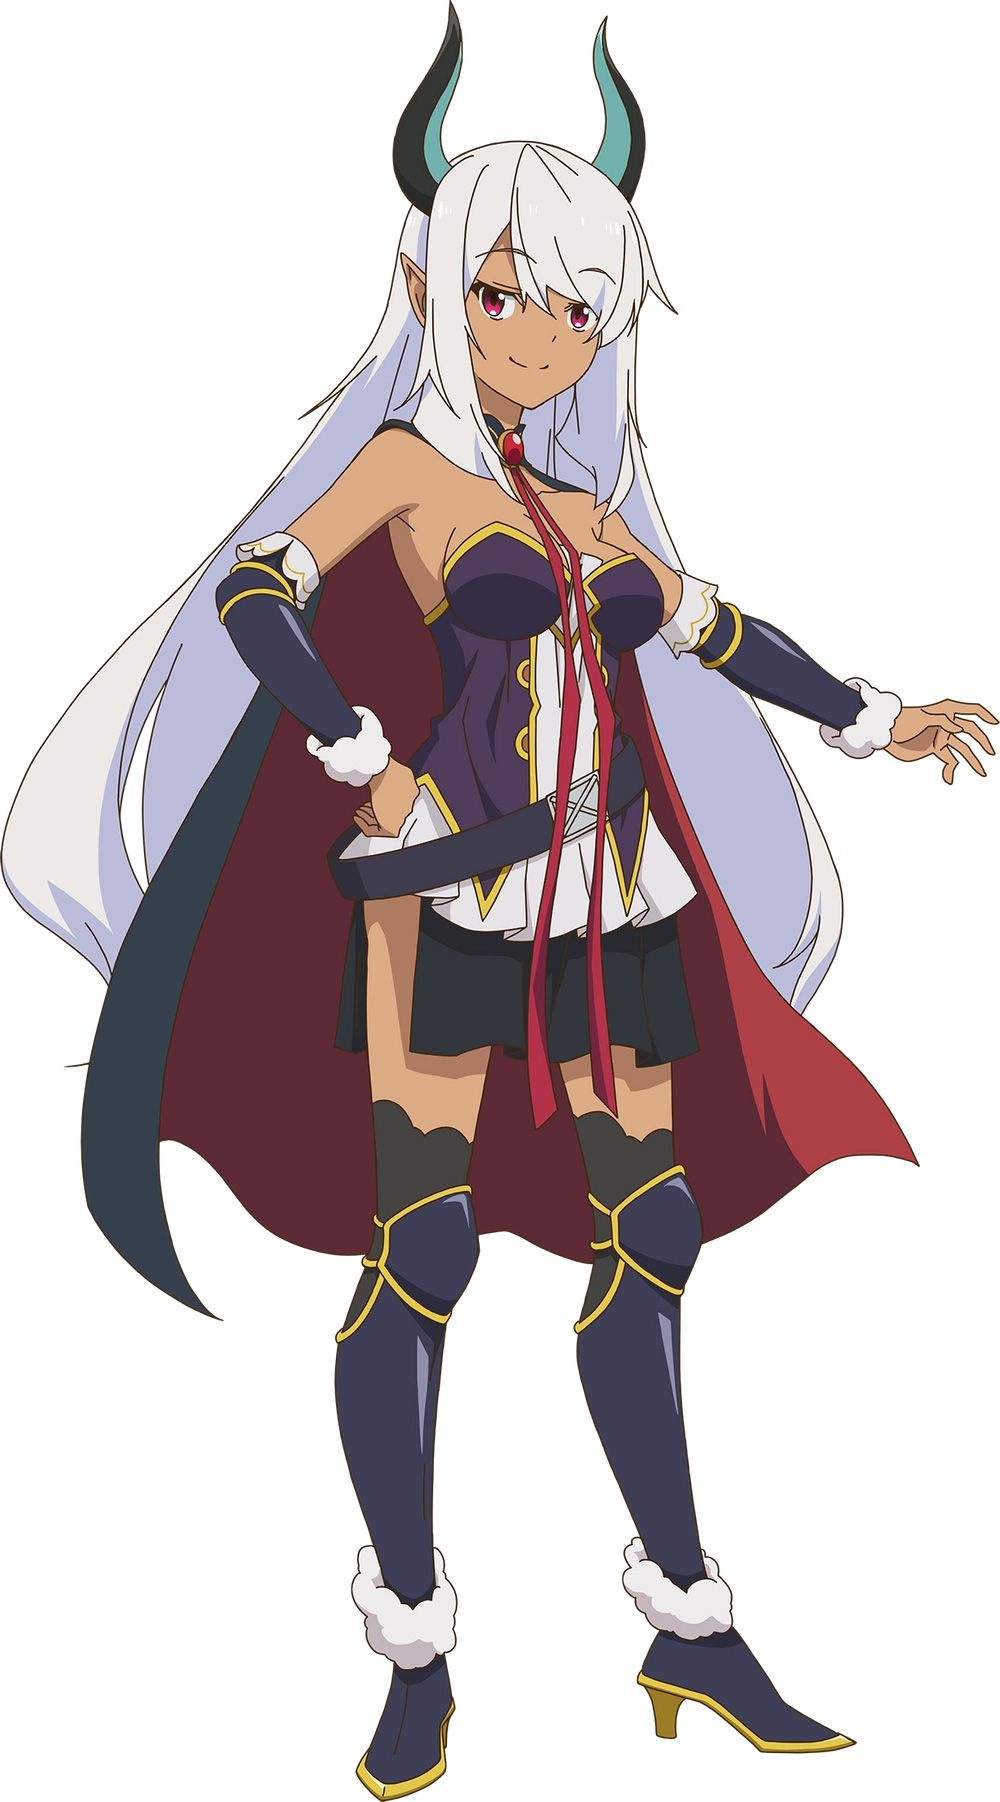 Slime-Taoshite-300-nen,-Shiranai-Uchi-ni-Level-Max-ni-Nattemashita-Anime-Character-Designs-Beelzebub